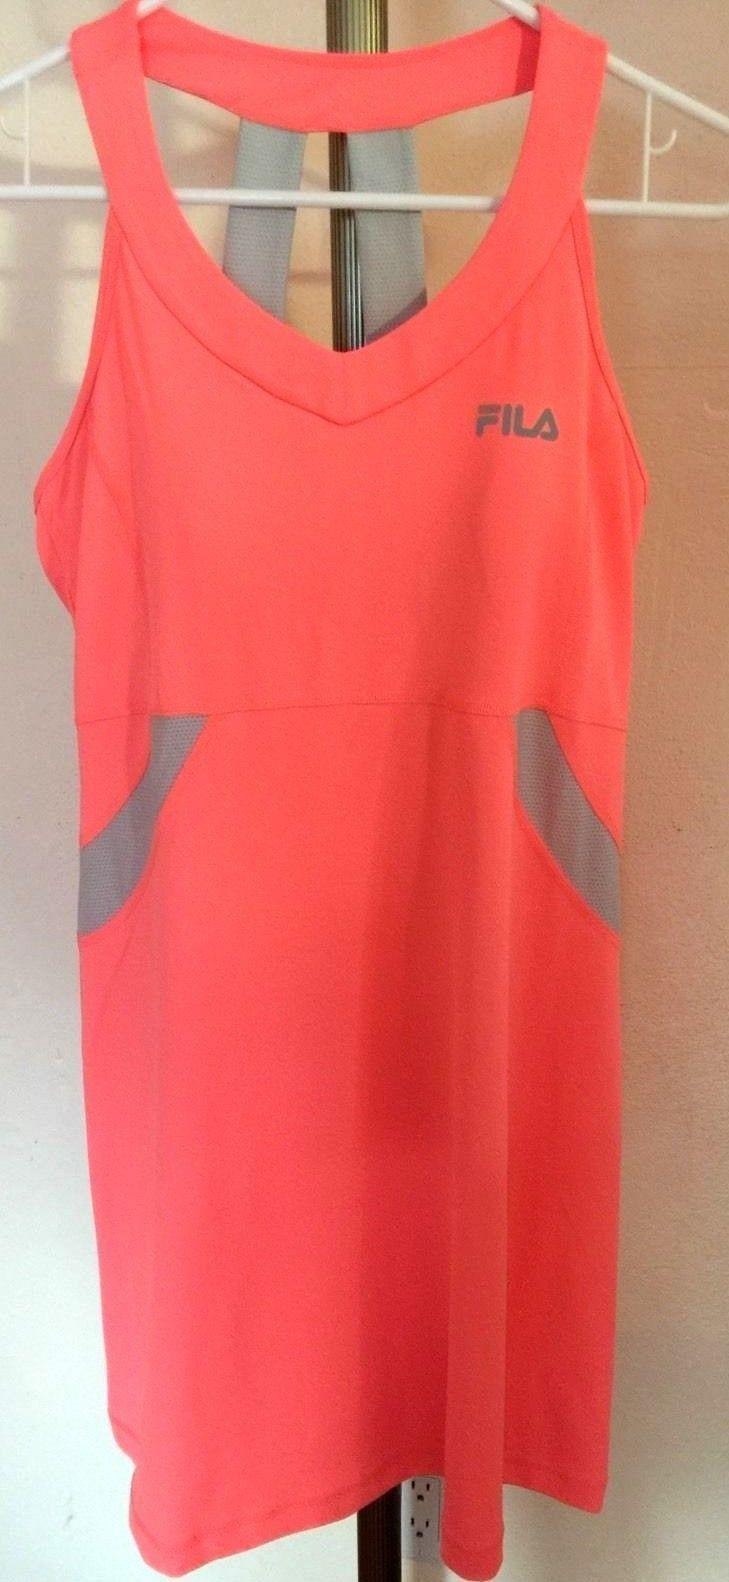 eda717490cd Fila Sport Performance Tennis Dress and 50 similar items. S l1600